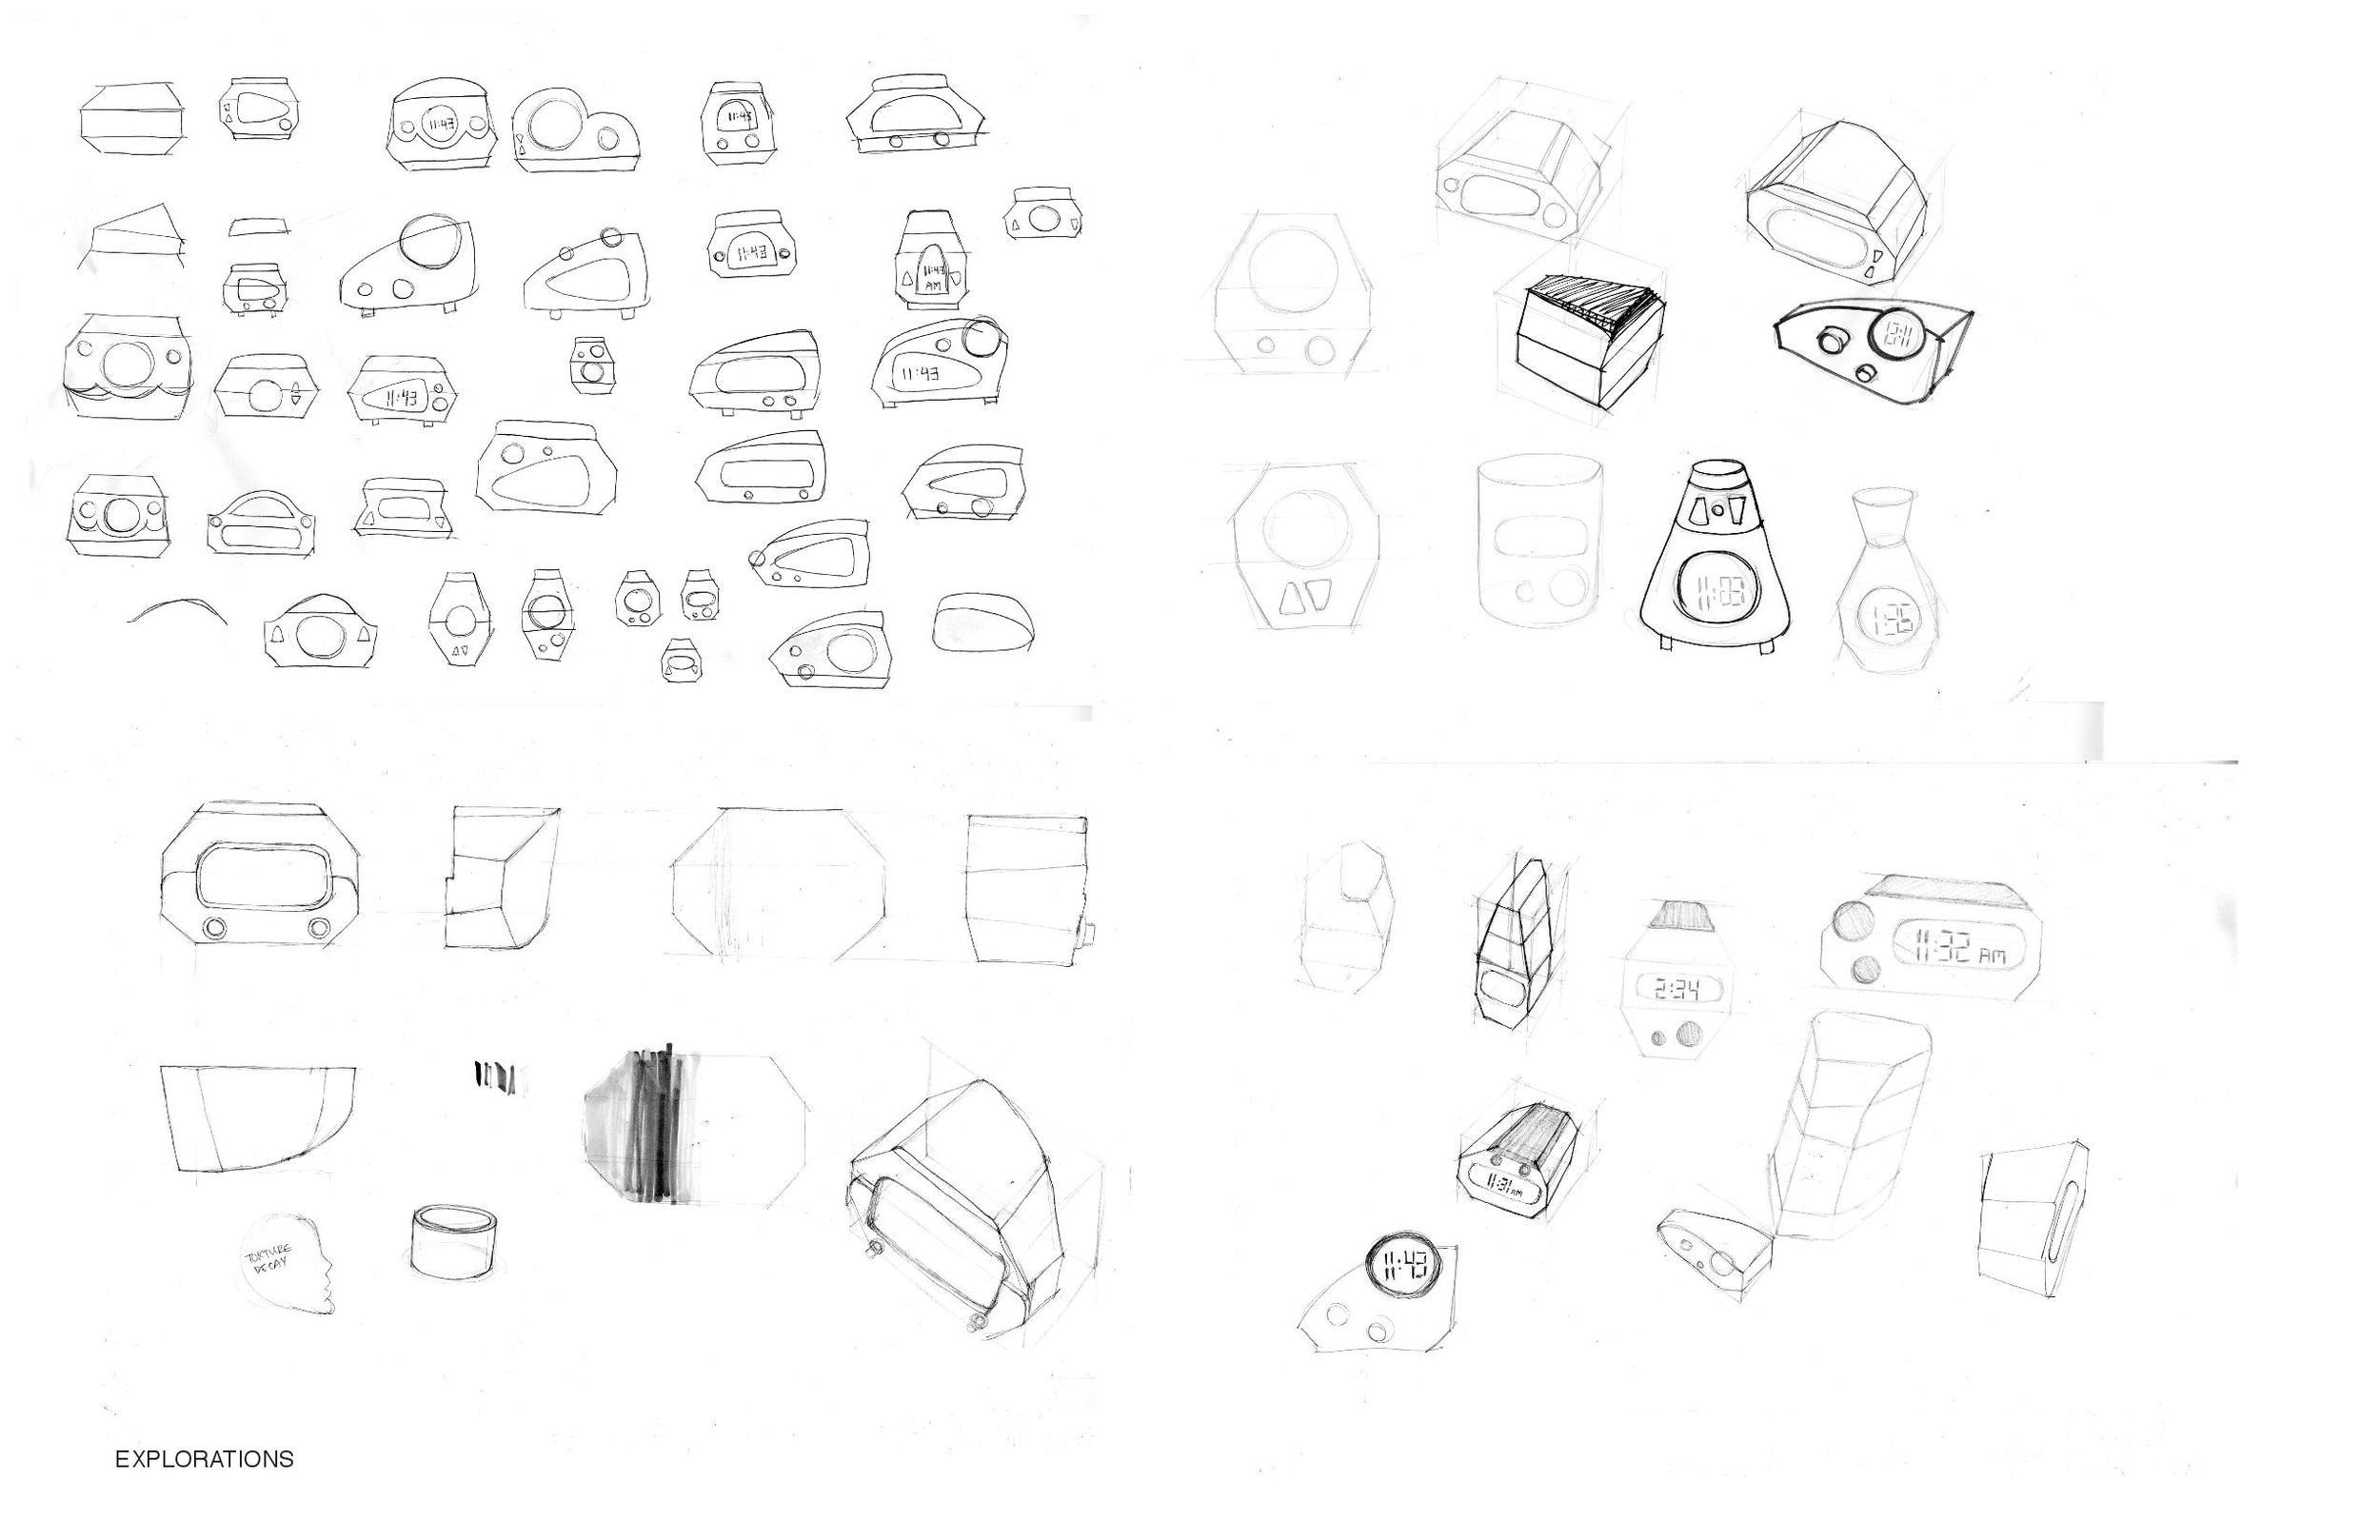 chiu mini cooper process-page-003.jpg